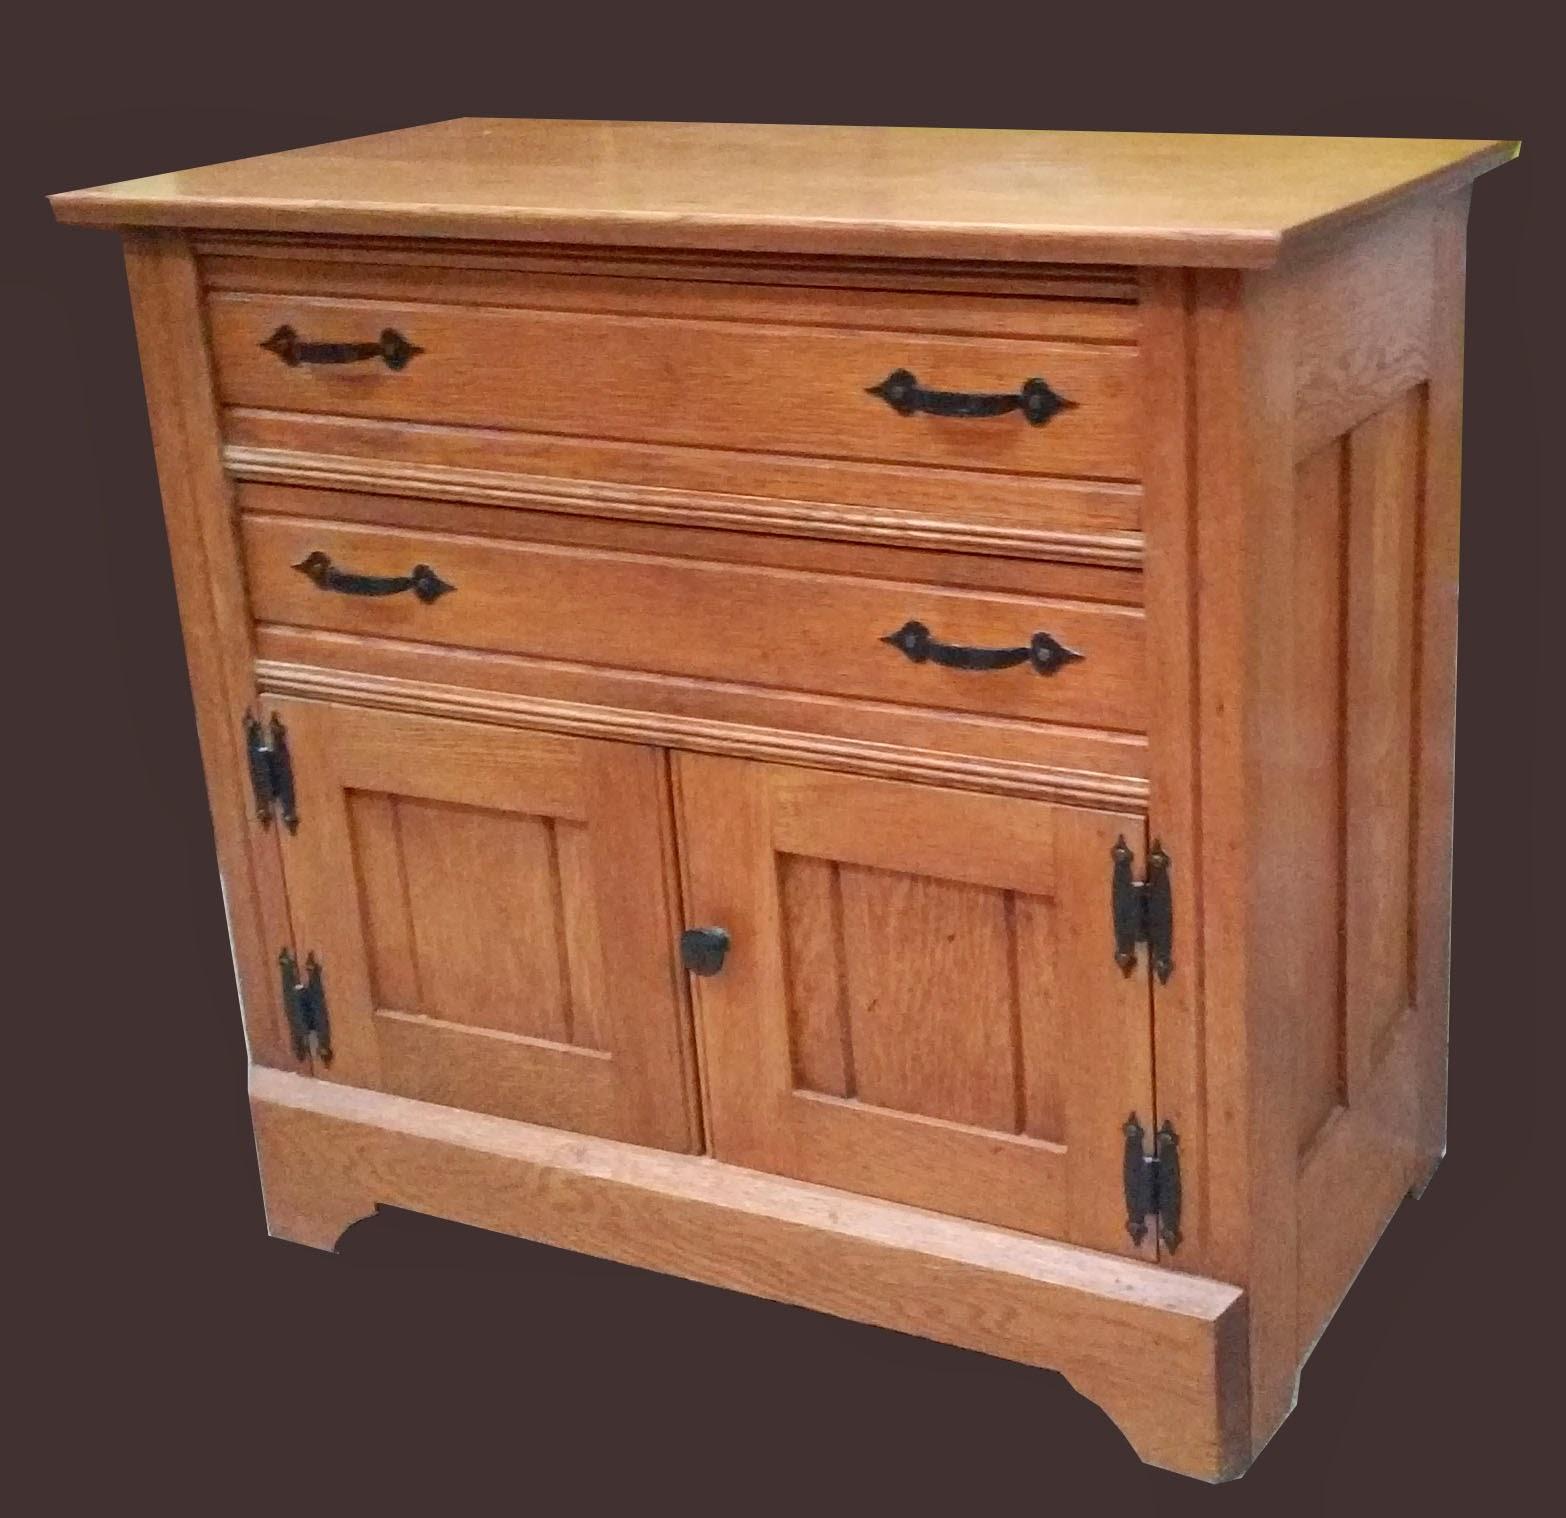 Uhuru furniture collectibles oak washstand reduced 95 for Reduced furniture